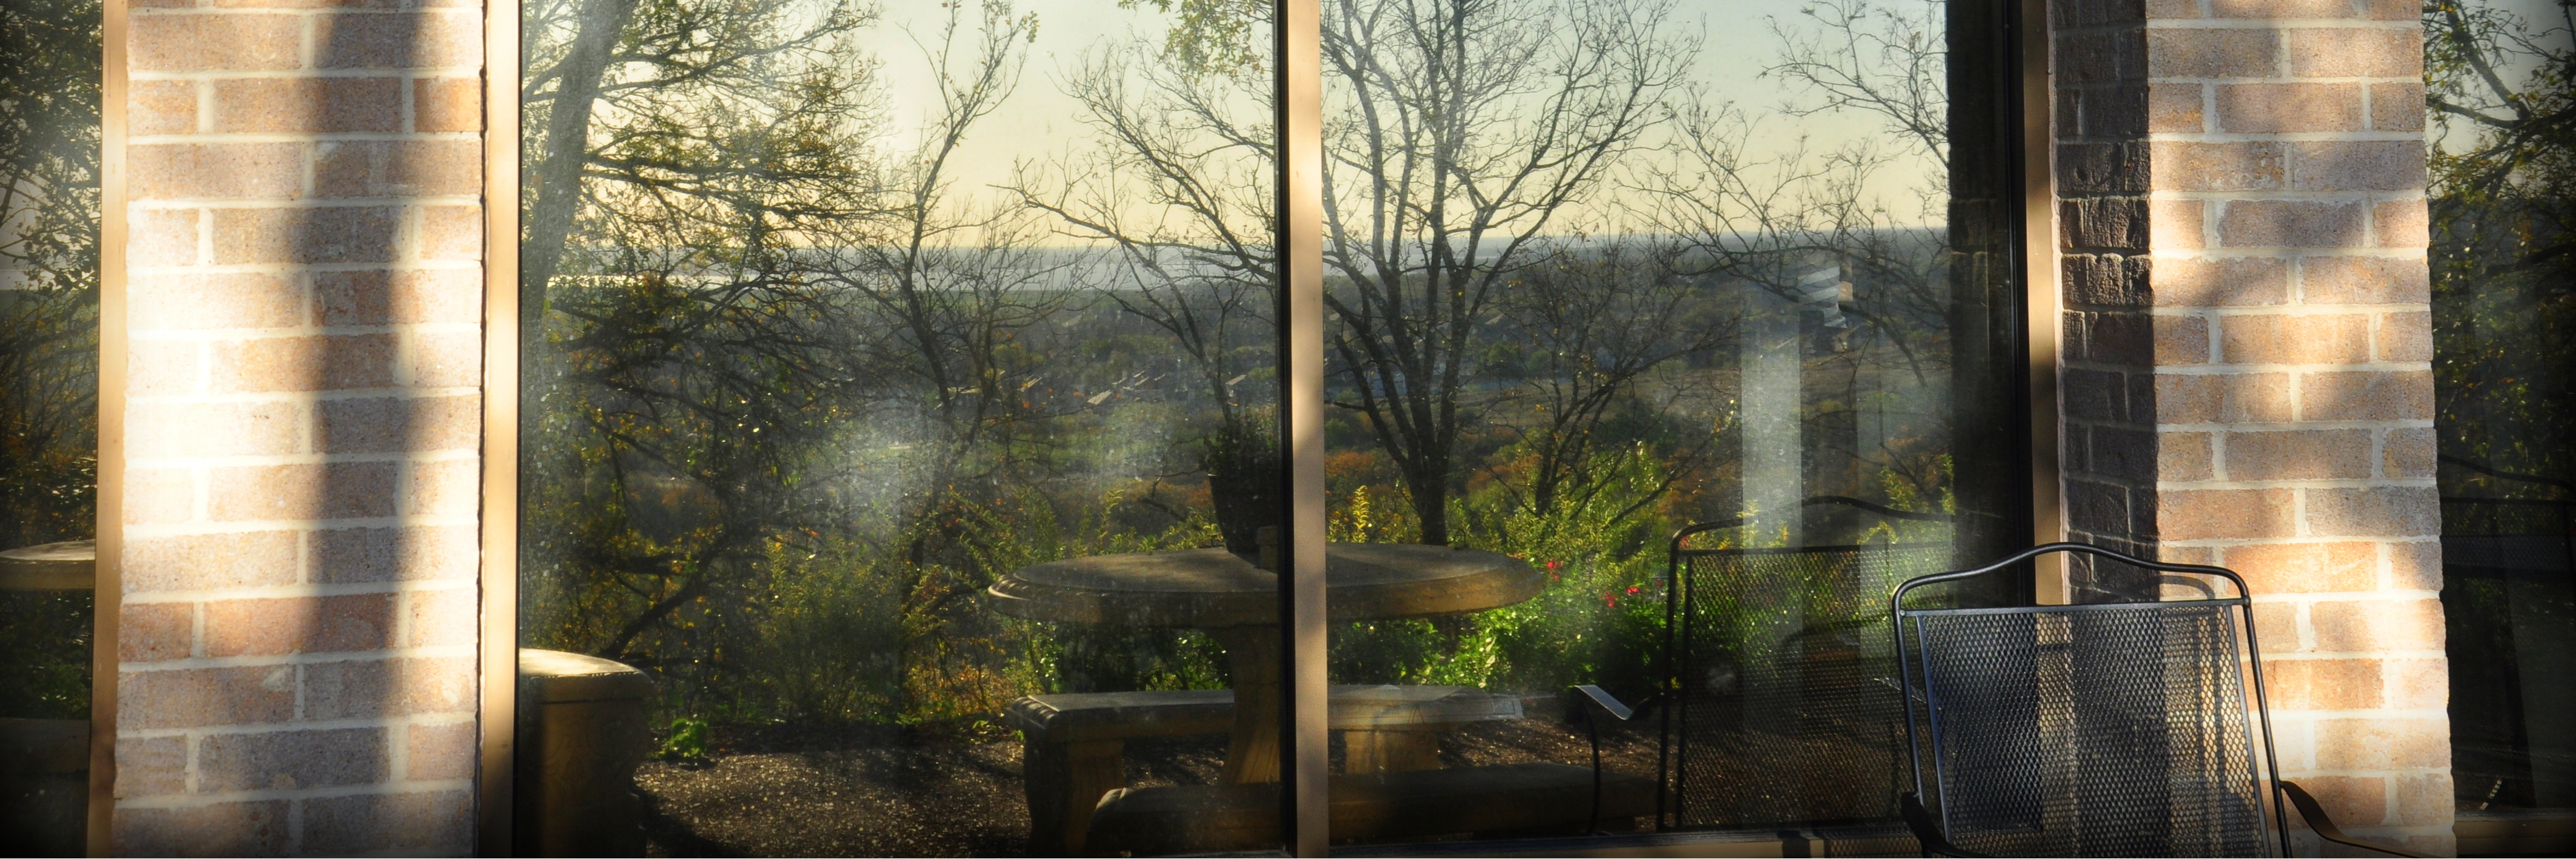 housing-window